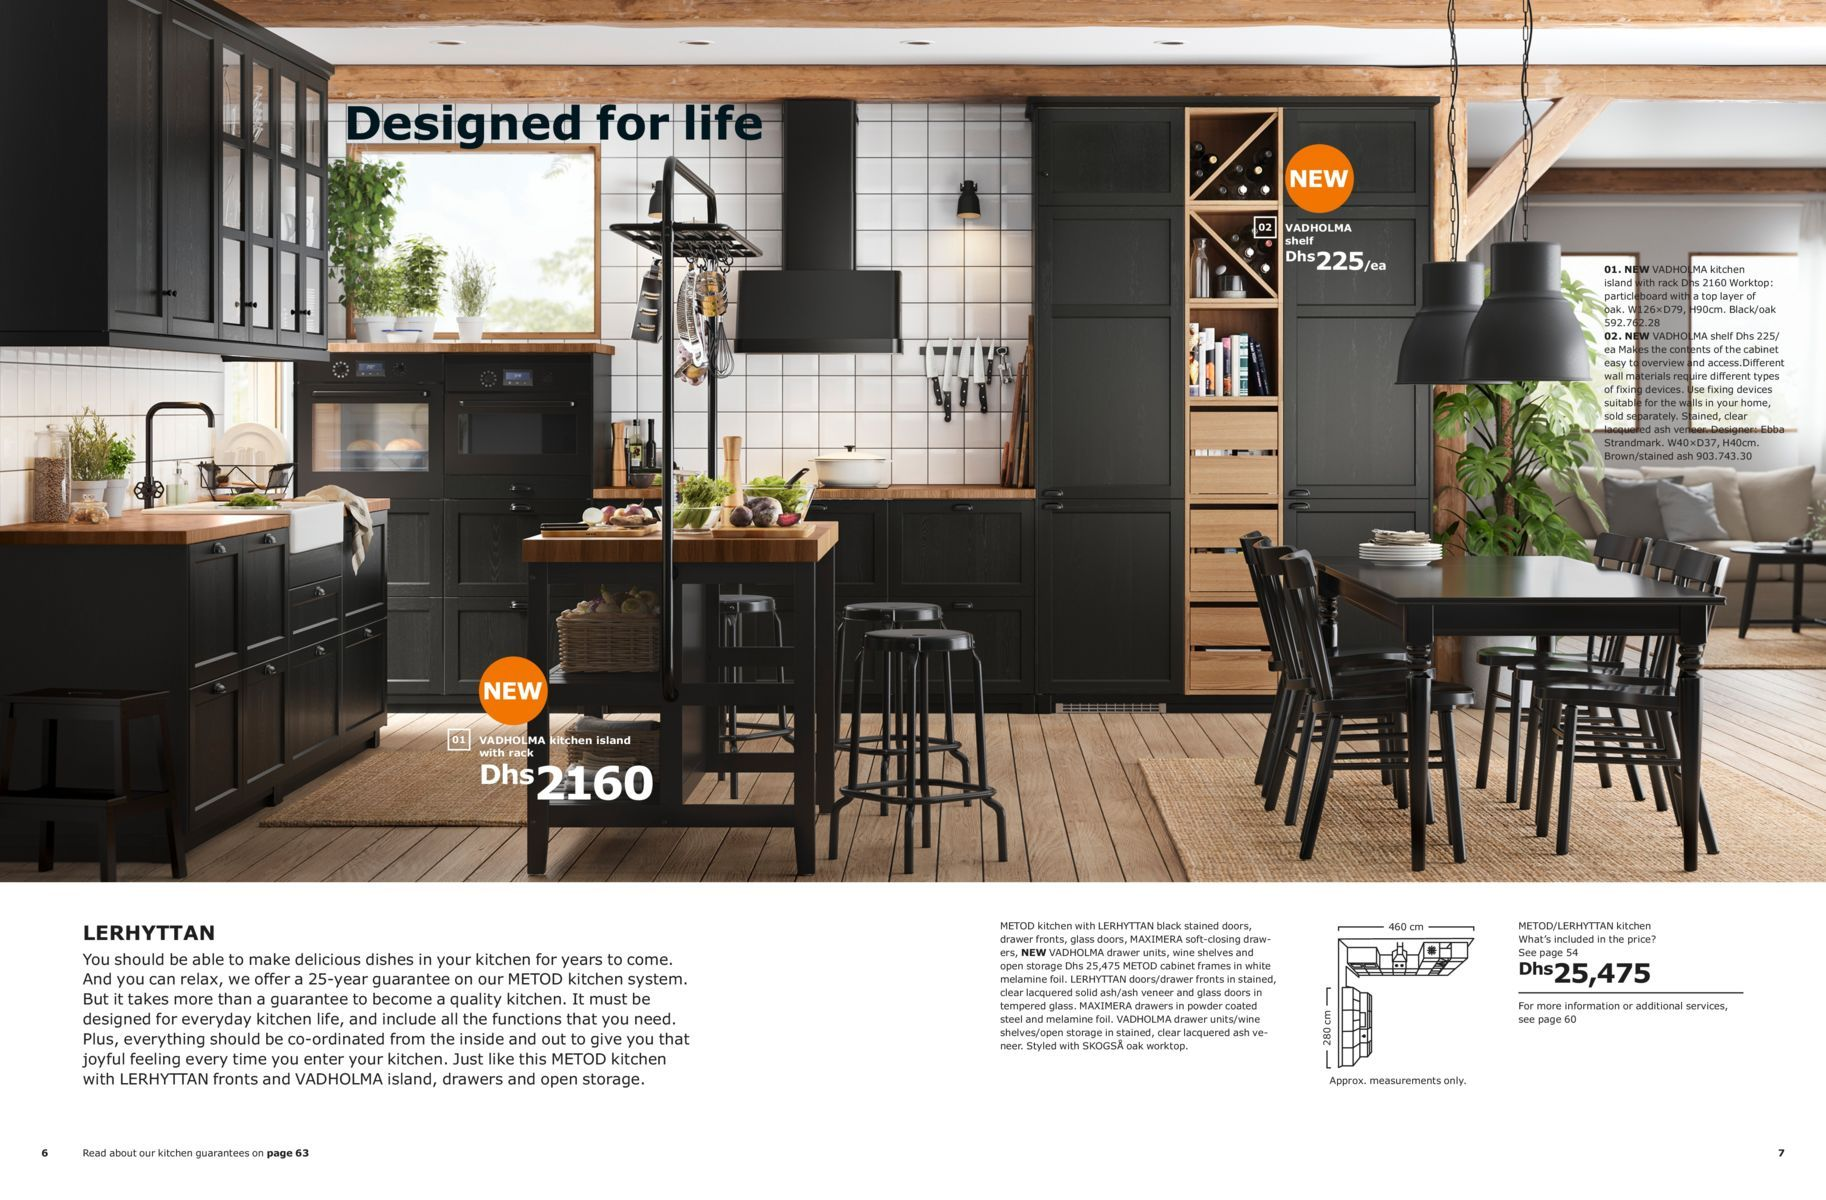 Designed For Life Ikea Kitchens Brochure 2019 Cuisine Ikea